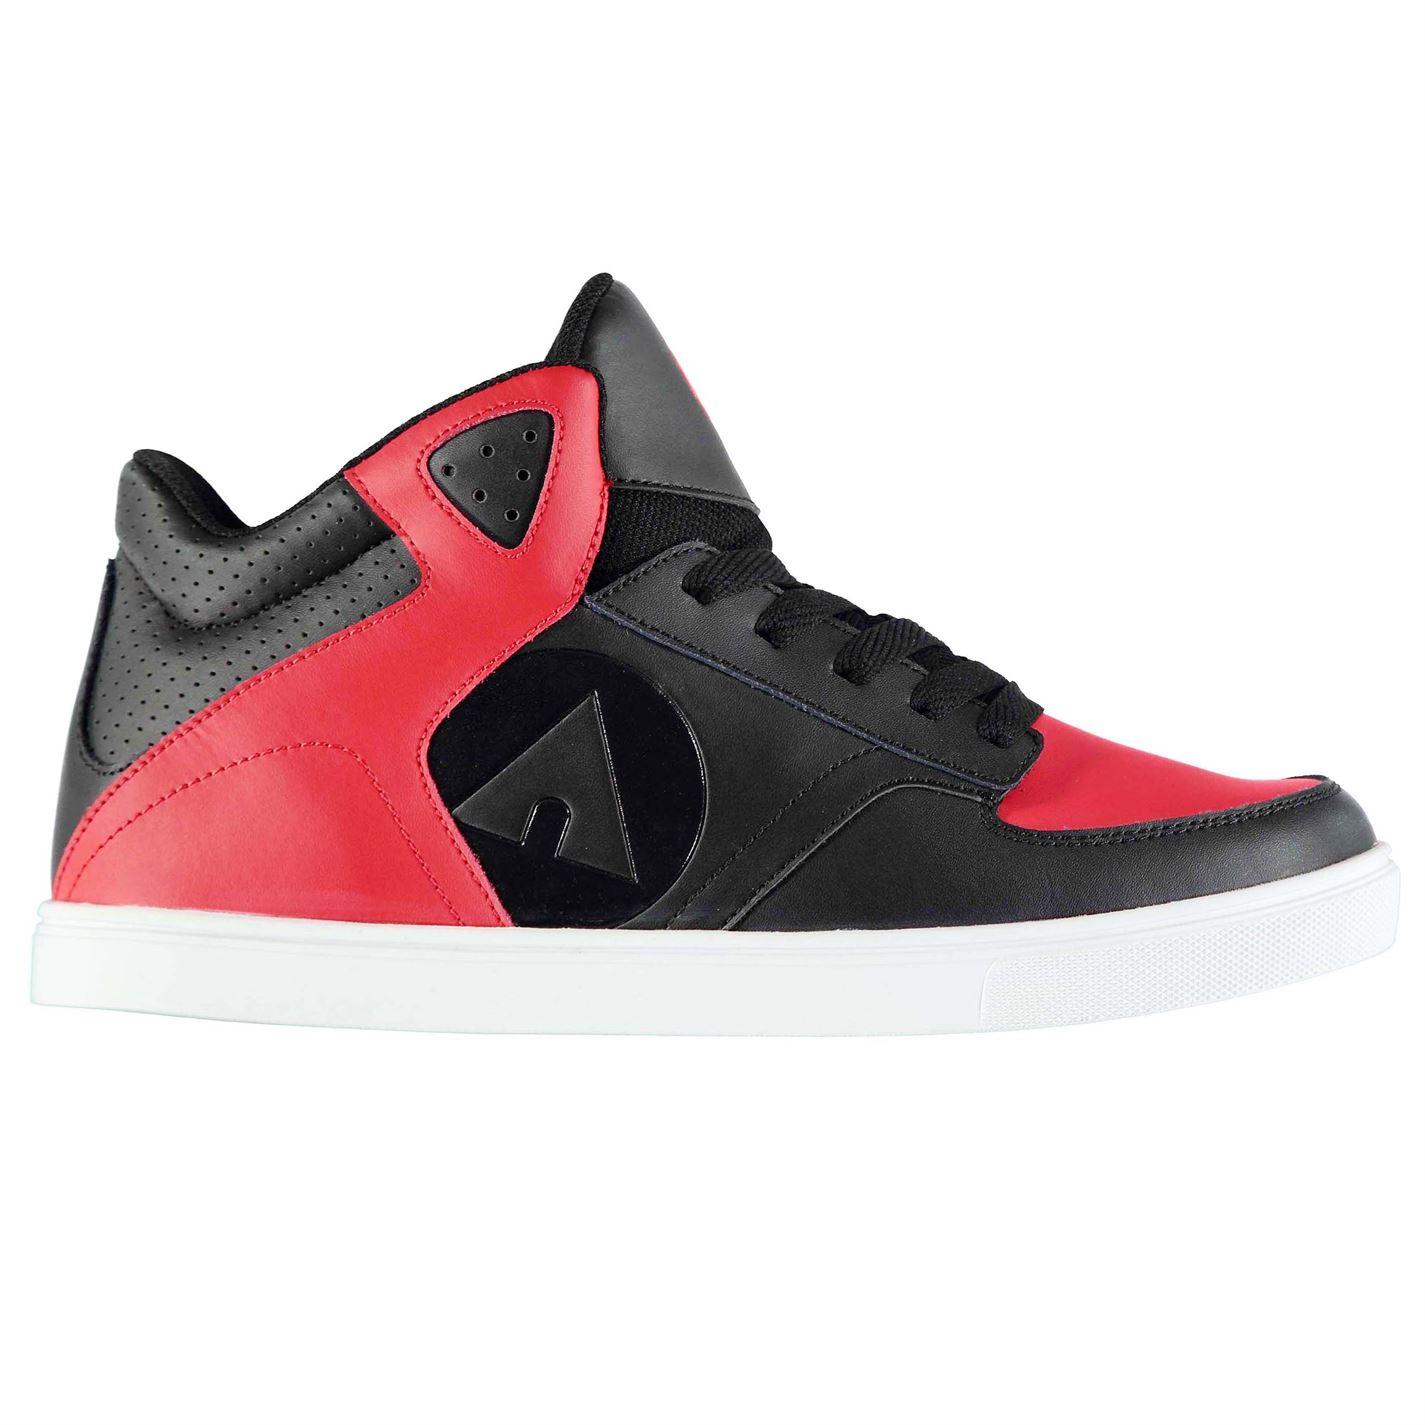 Airwalk Thrasher Mens Skate Shoes